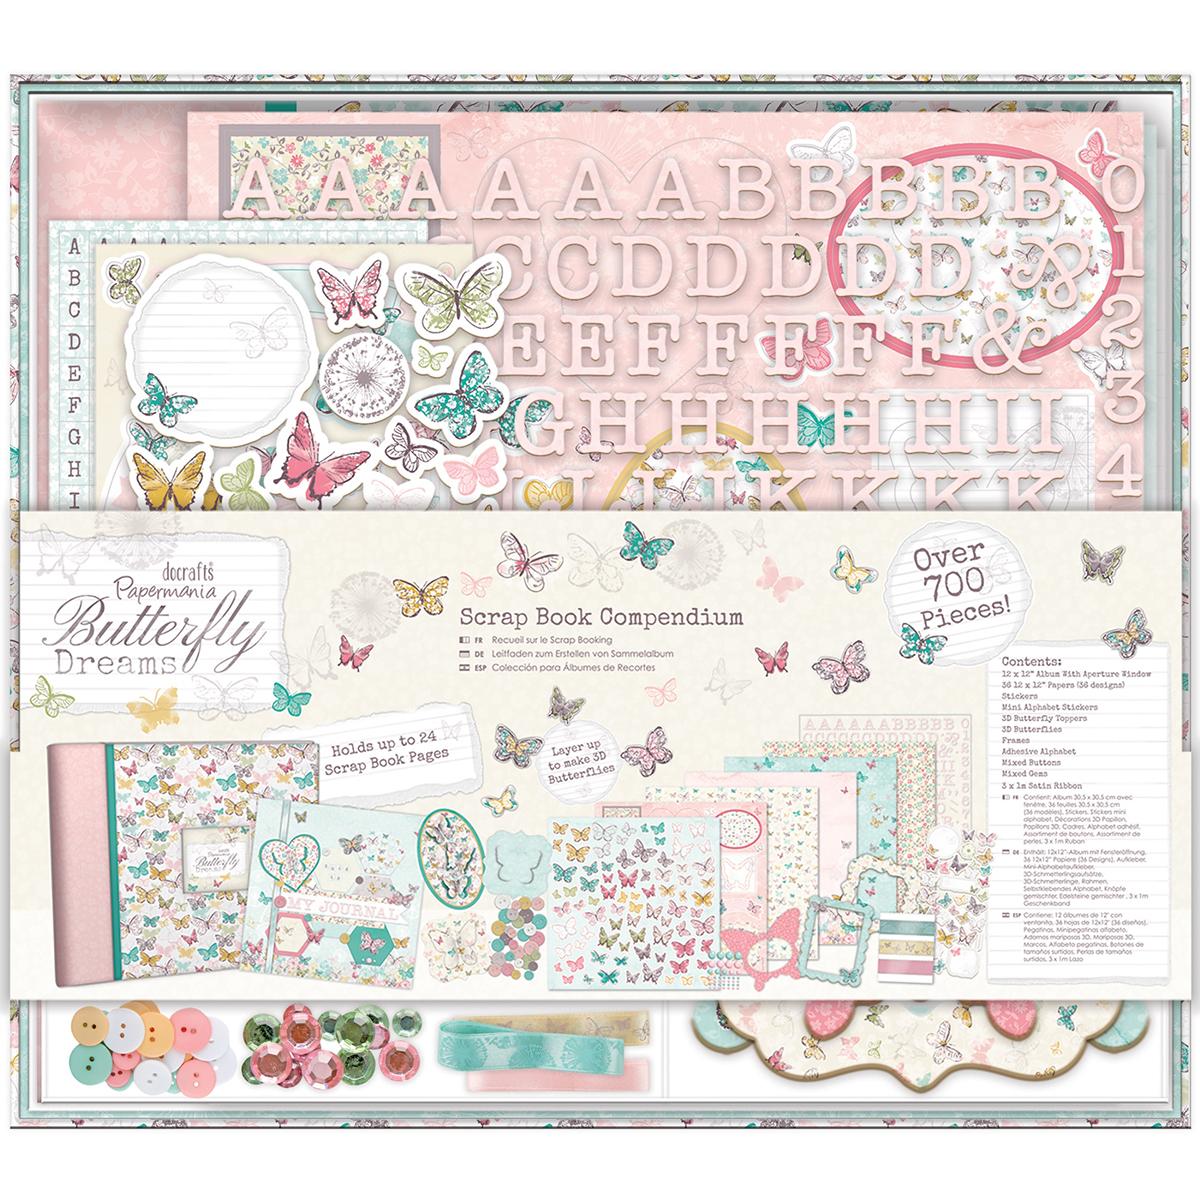 Papermania Butterfly Dreams Compendium Scrapbook